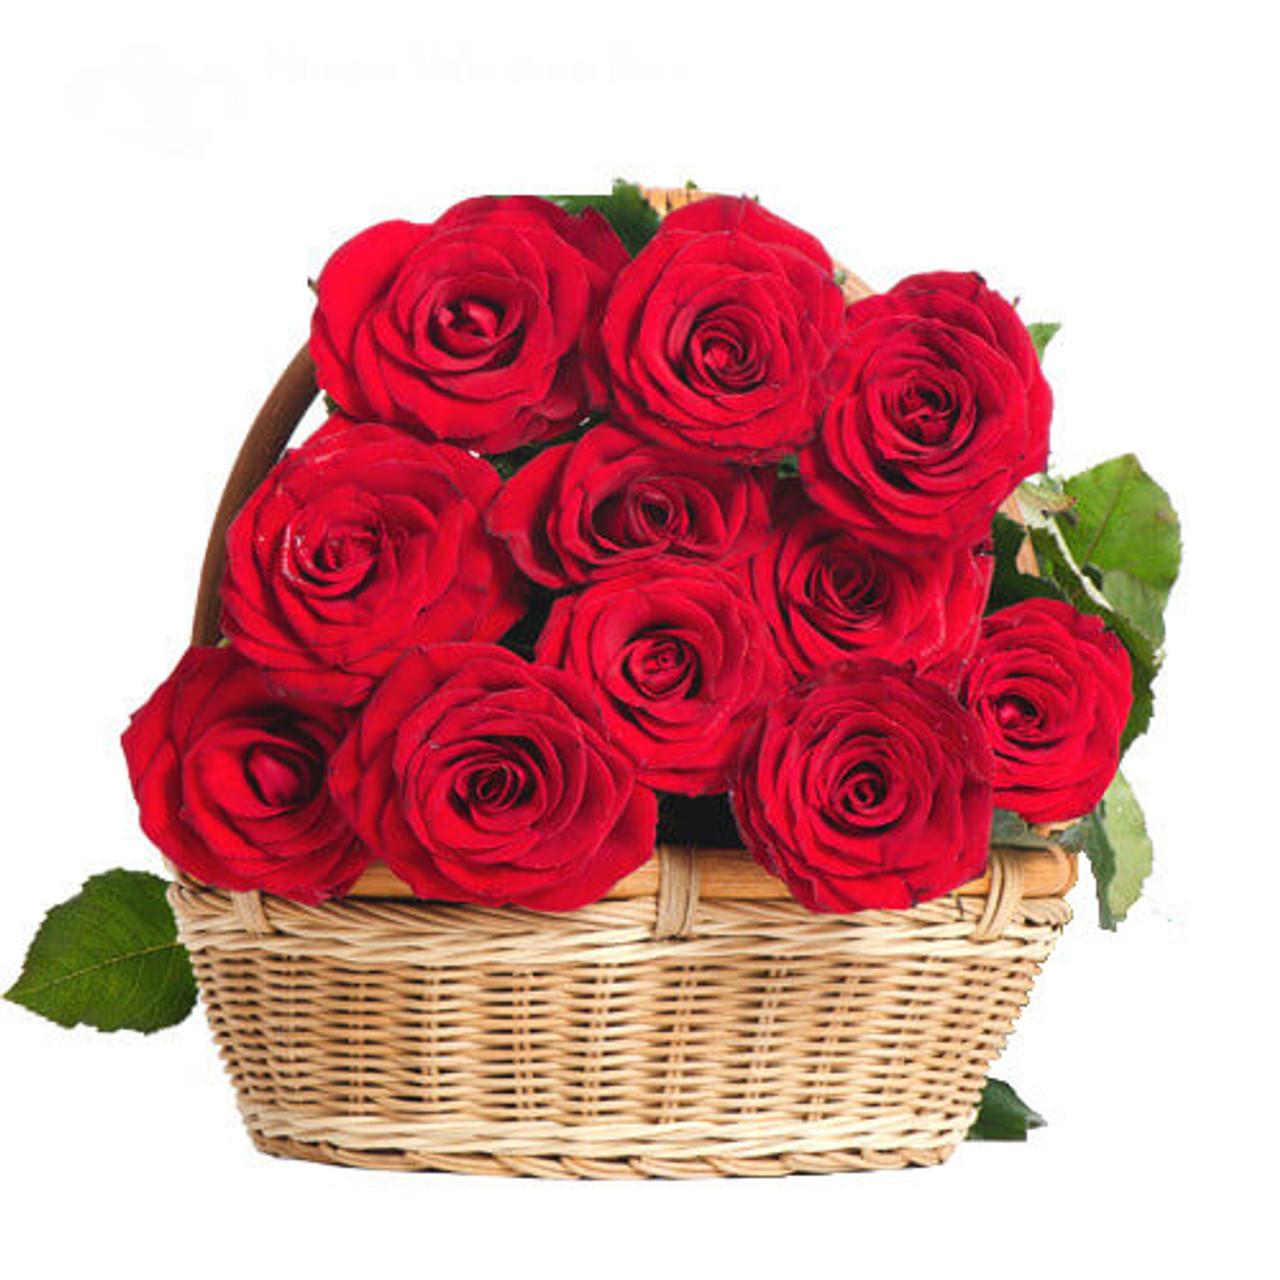 10 Red Ecuadorian Roses Basket